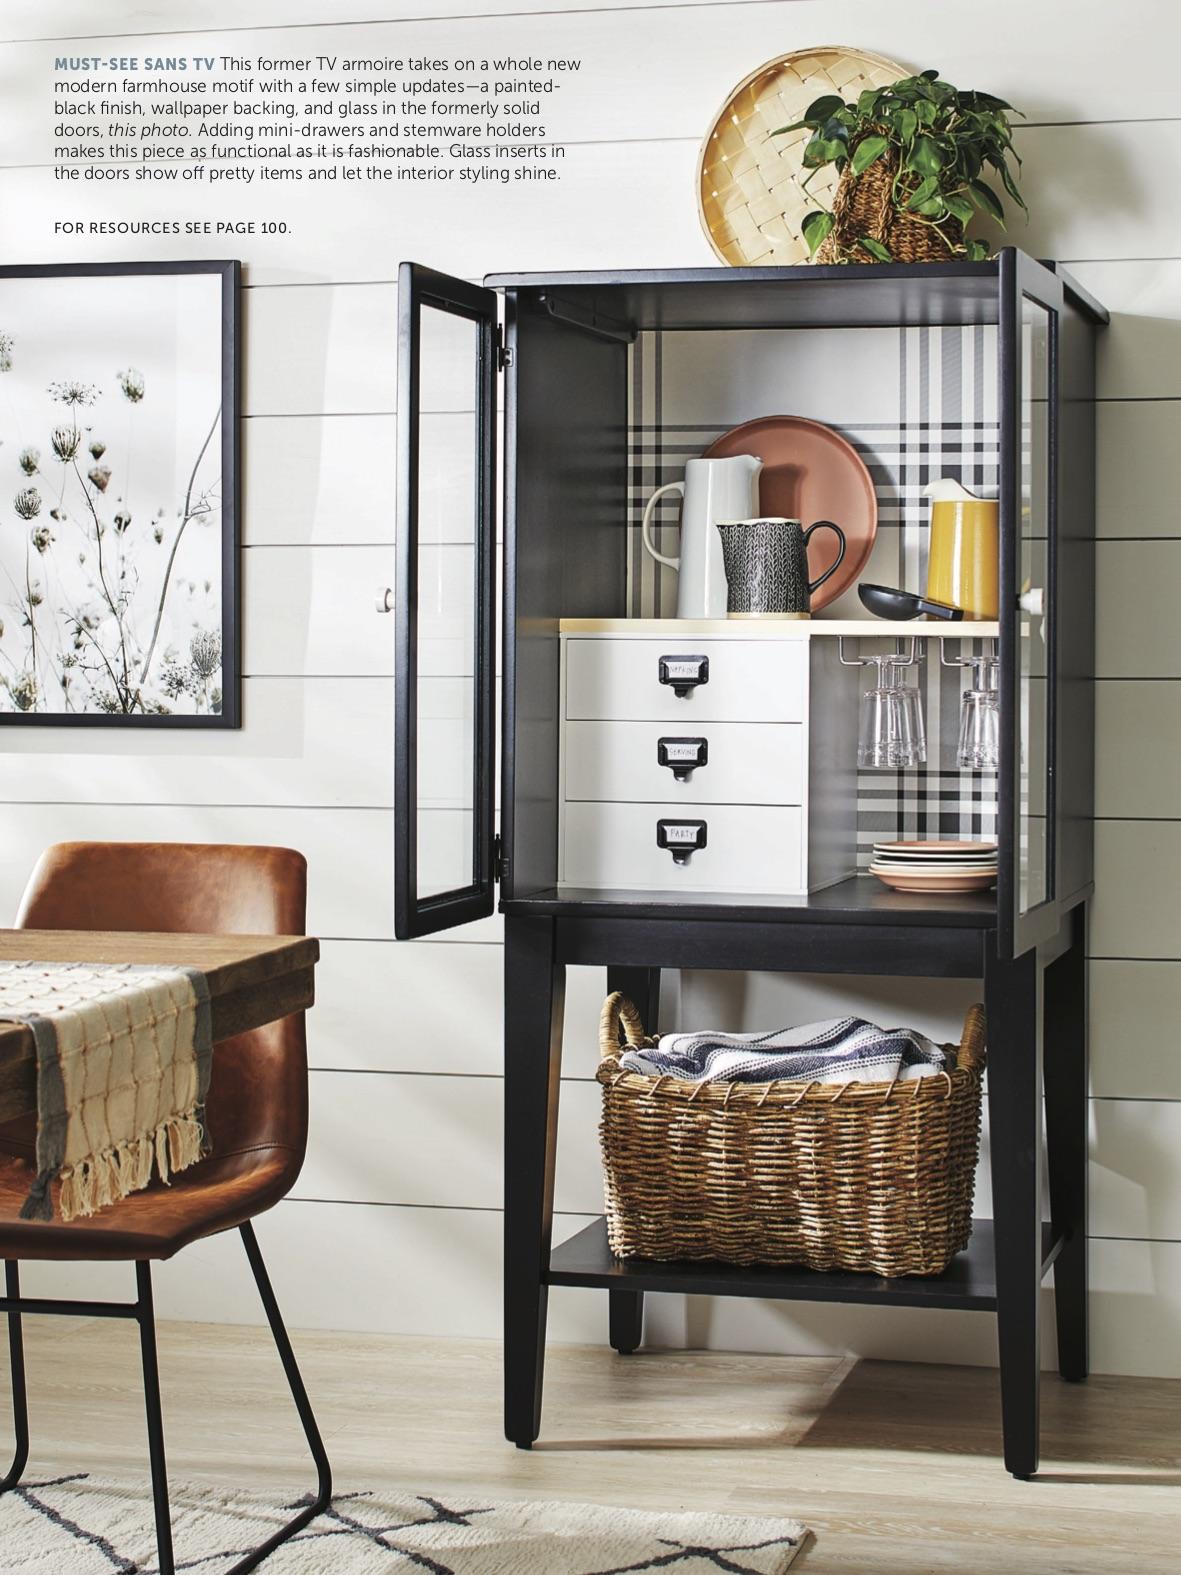 084 DIY1419 Furniture Makeovers.jpg